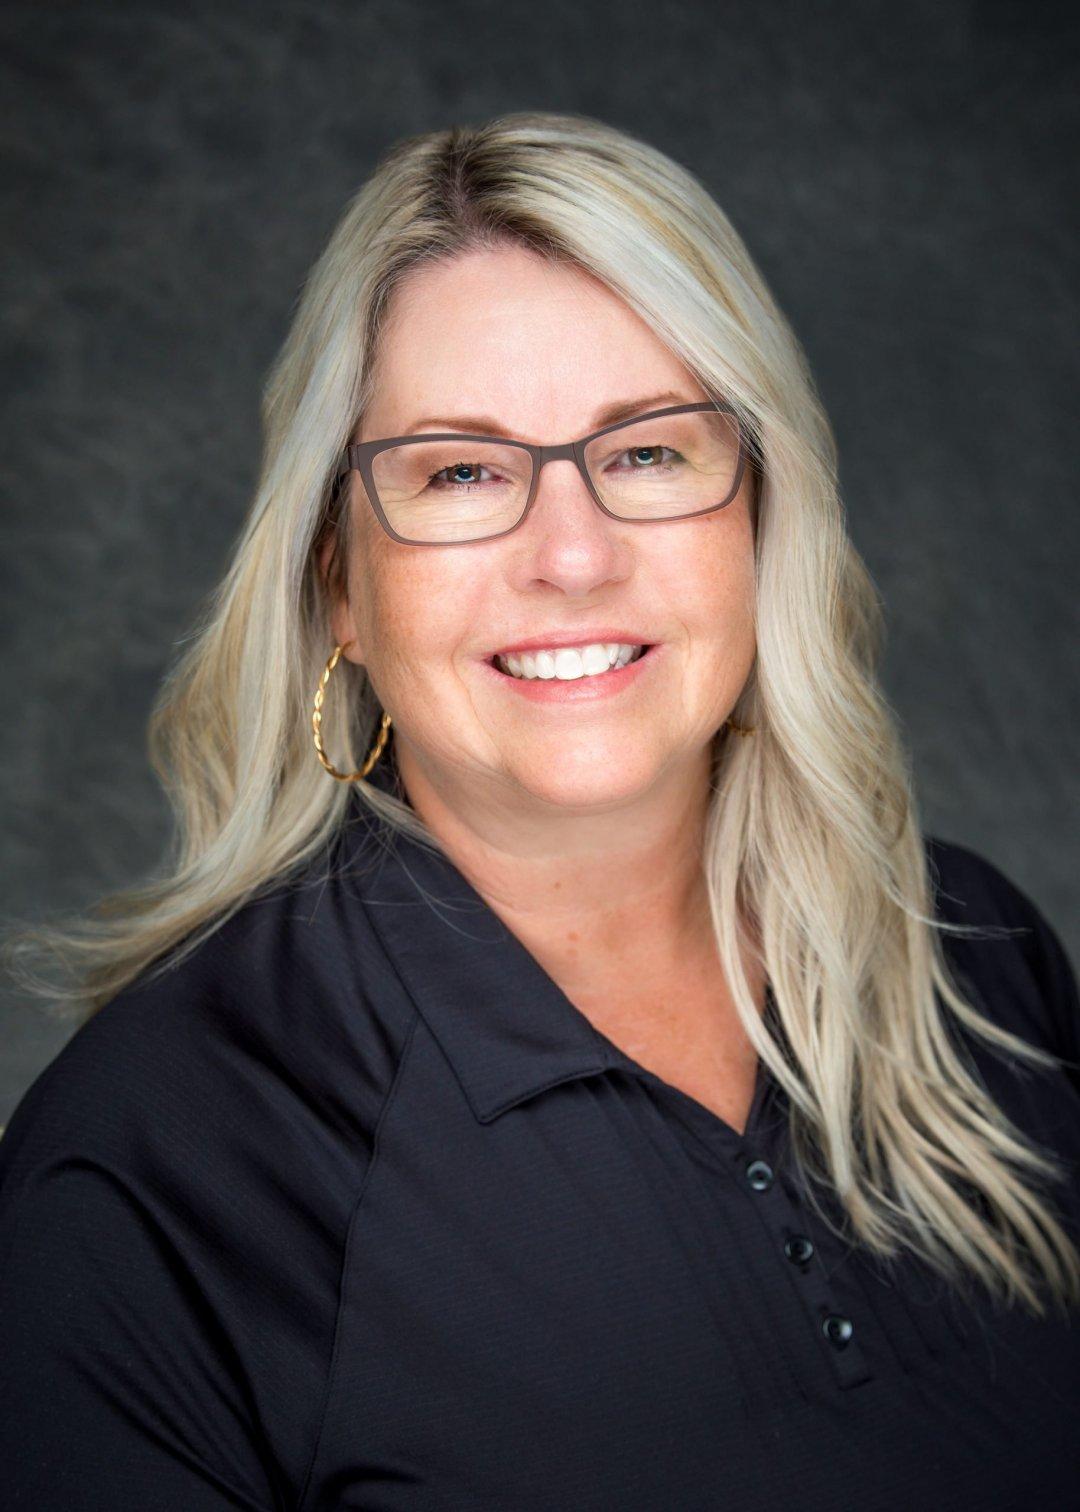 Janice Berkenheger